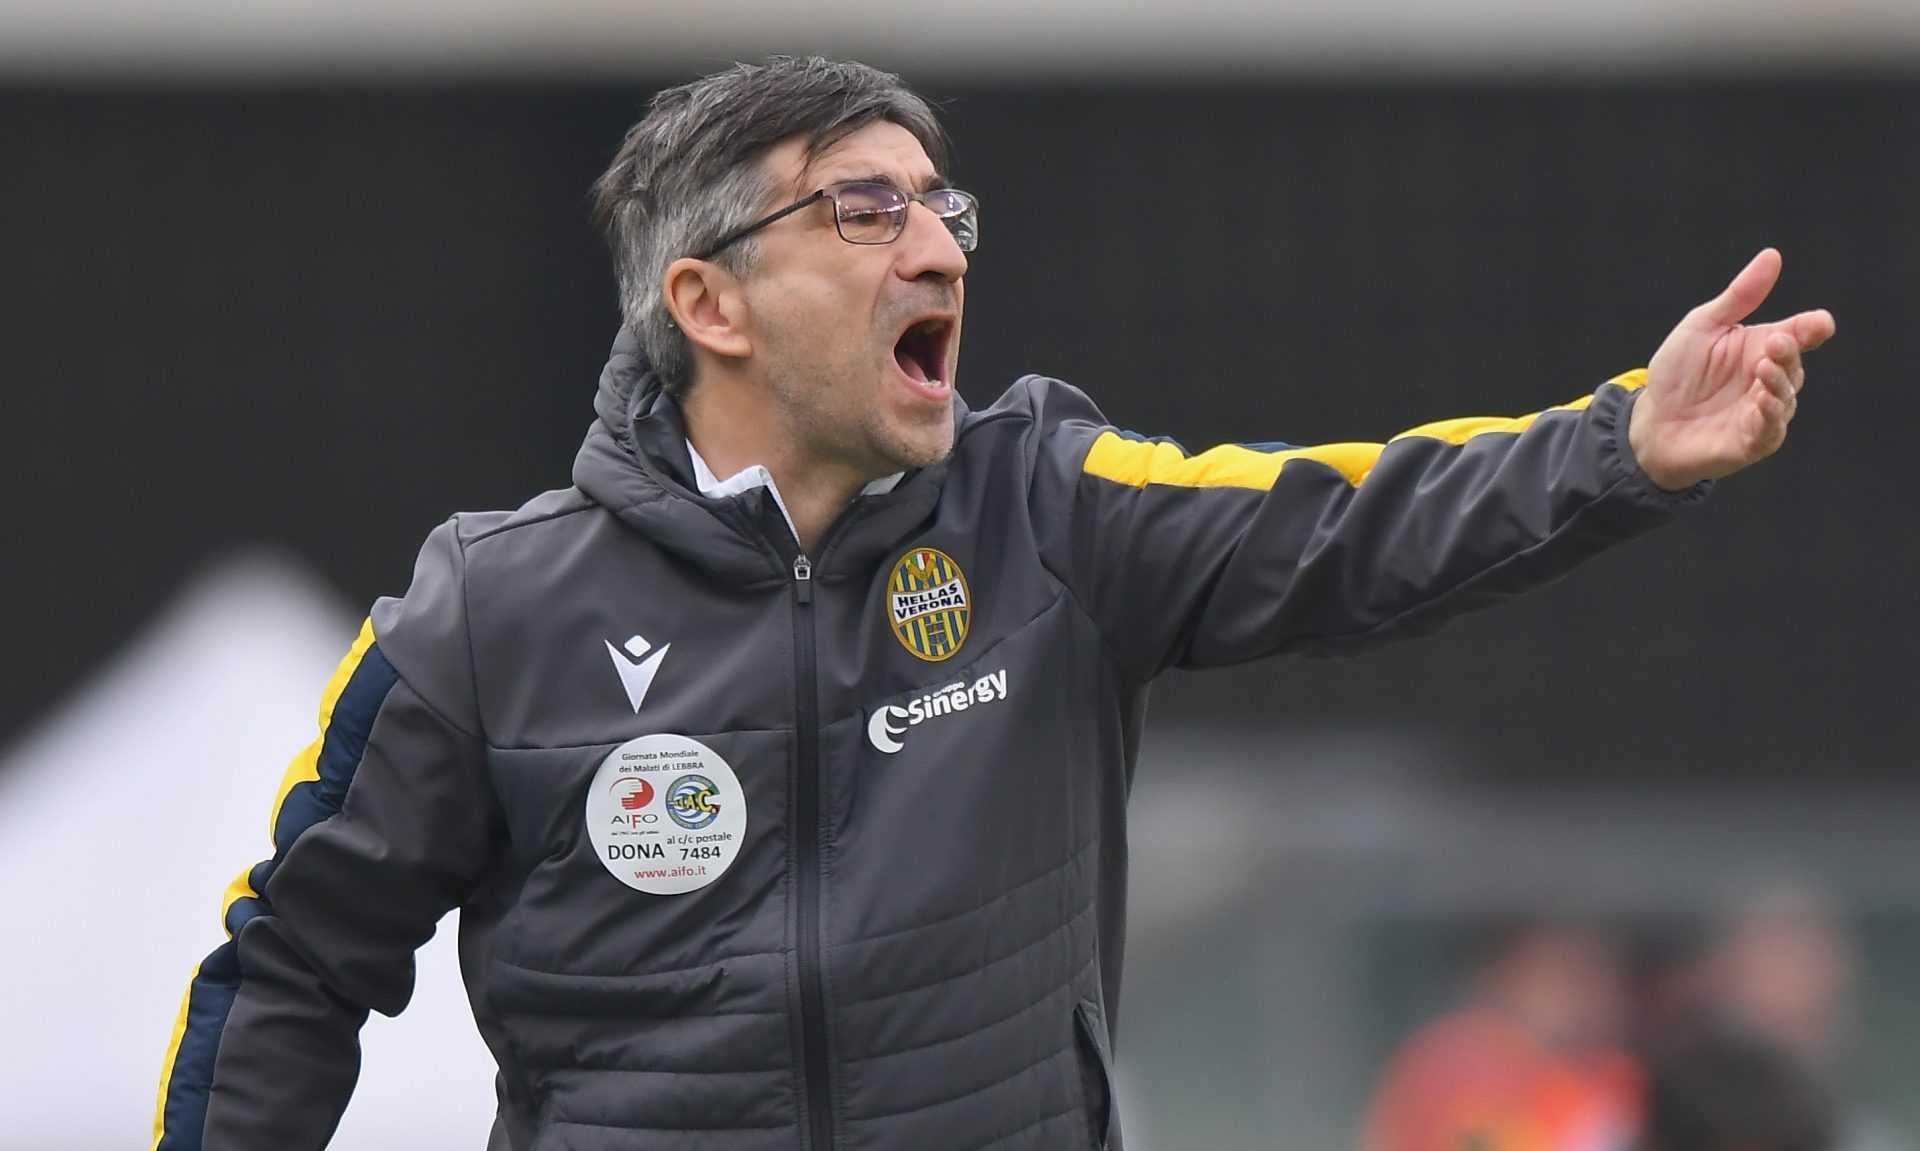 Le pagelle di Verona-Fiorentina (1-2): Vlahovic implacabile